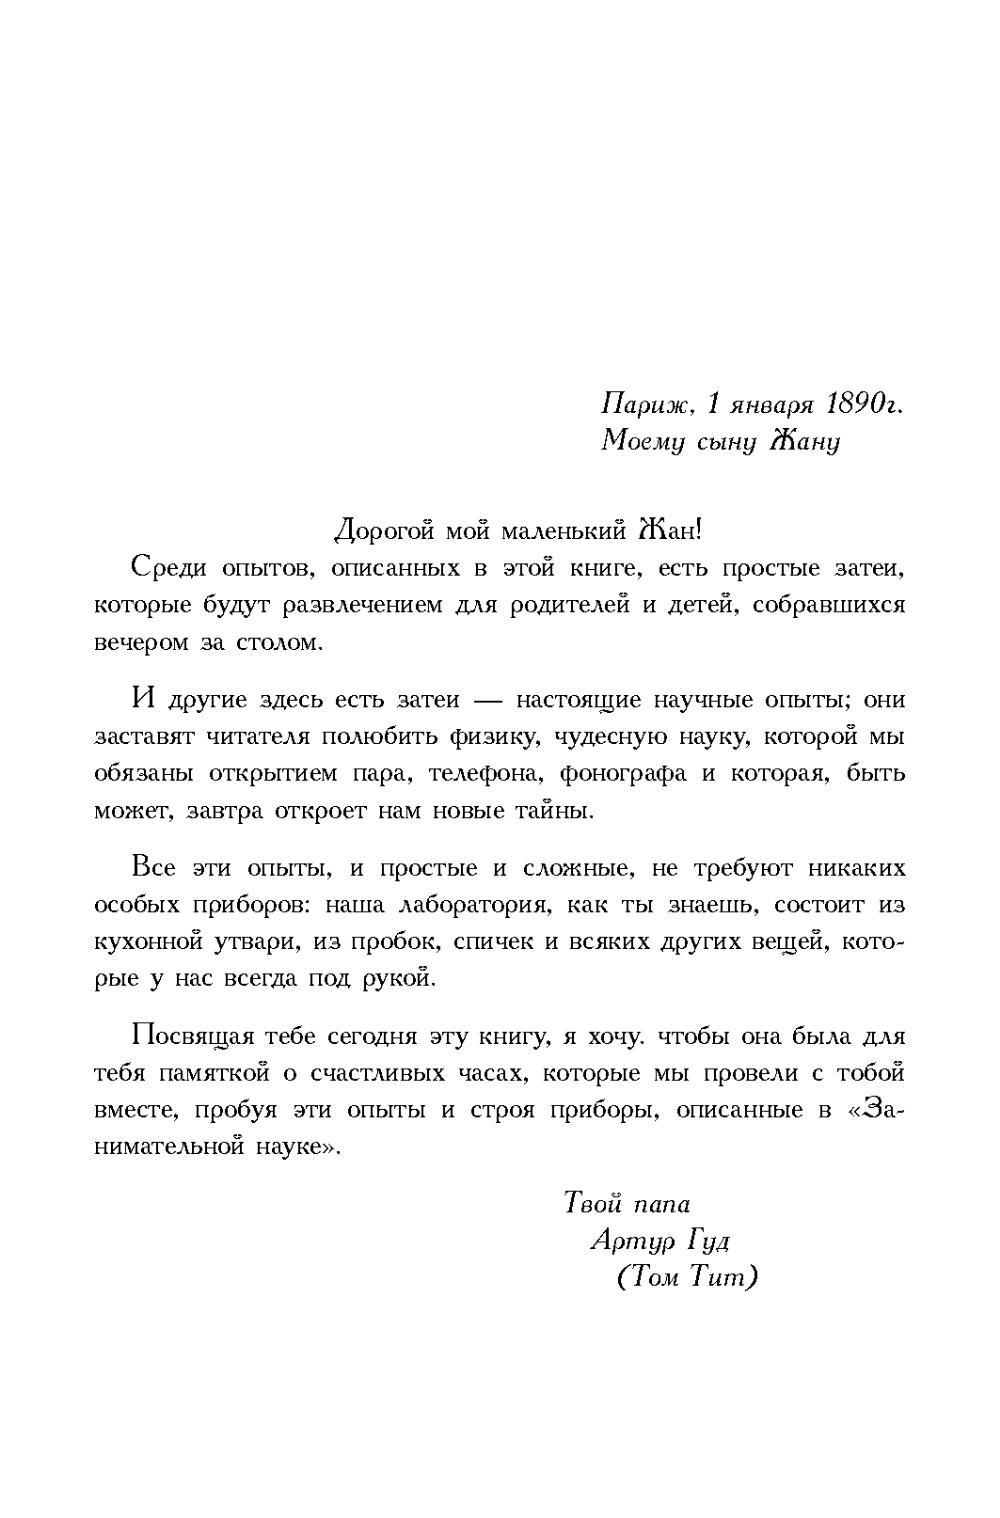 http://i6.imageban.ru/out/2013/10/28/fa7007f8f6c14f504eba83d37a3ac230.jpg